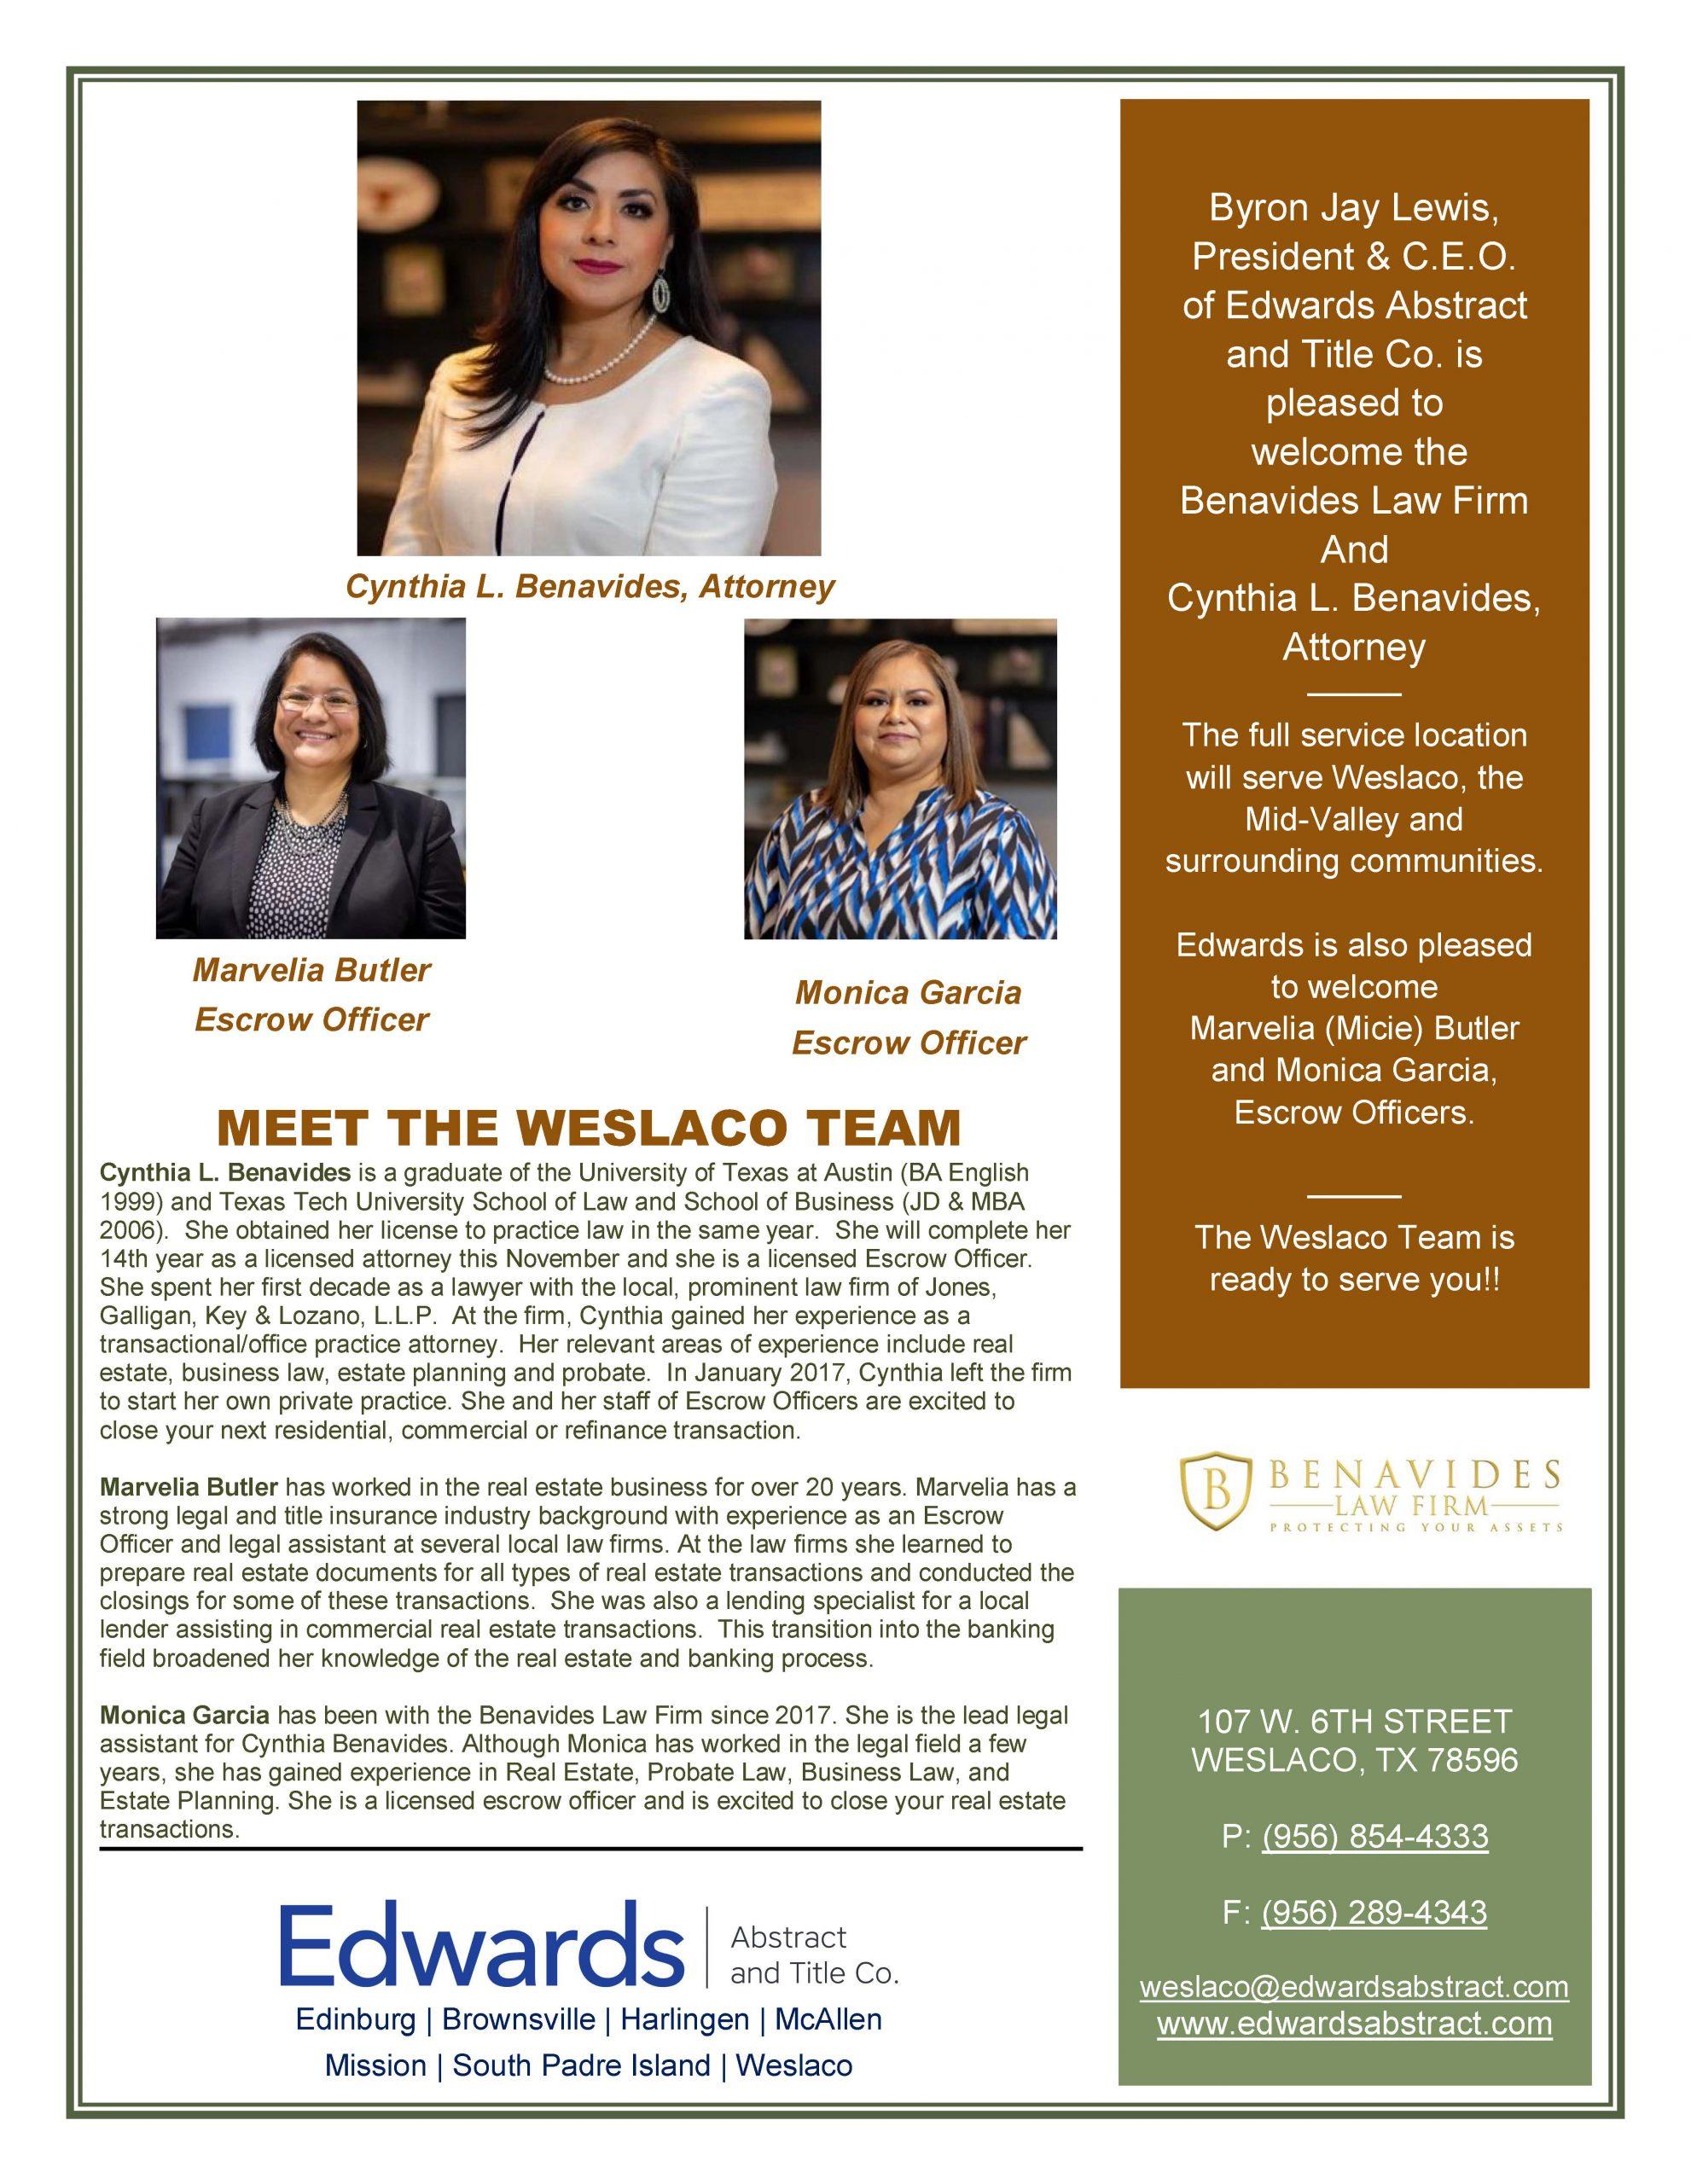 Edwards welcomes Weslaco Team!